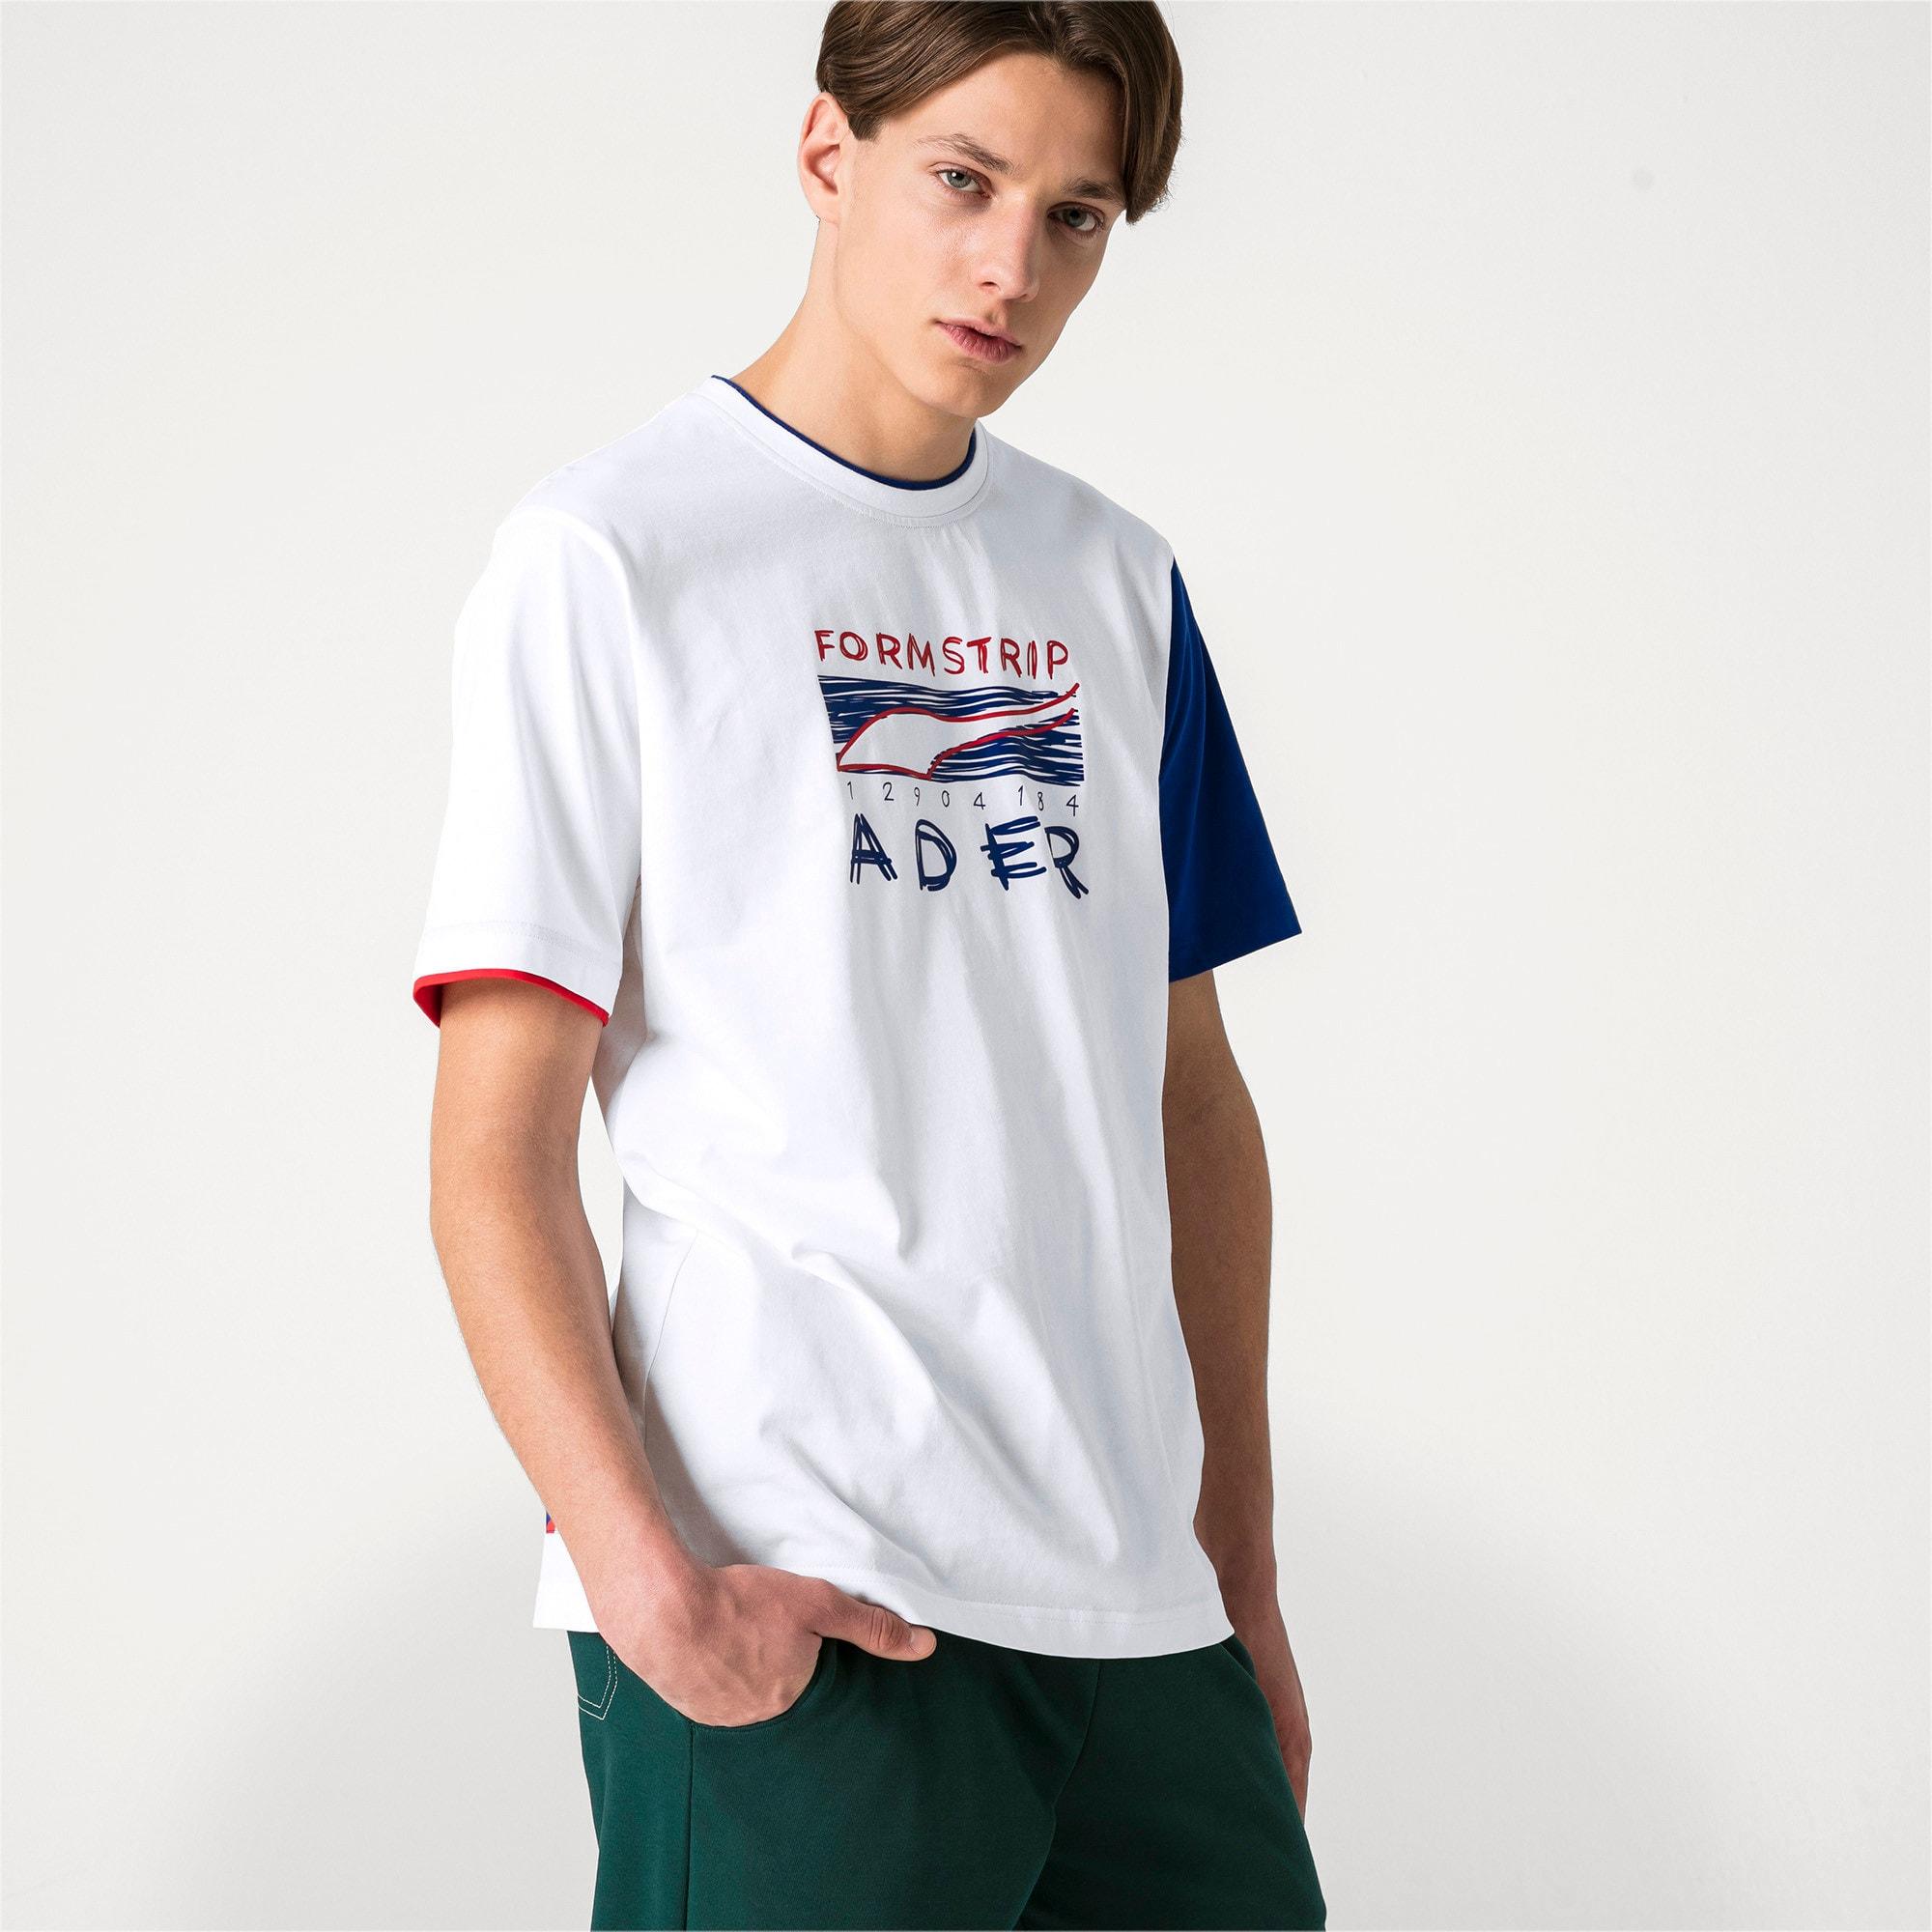 Thumbnail 2 of PUMA x ADER T-Shirt, Puma White, medium